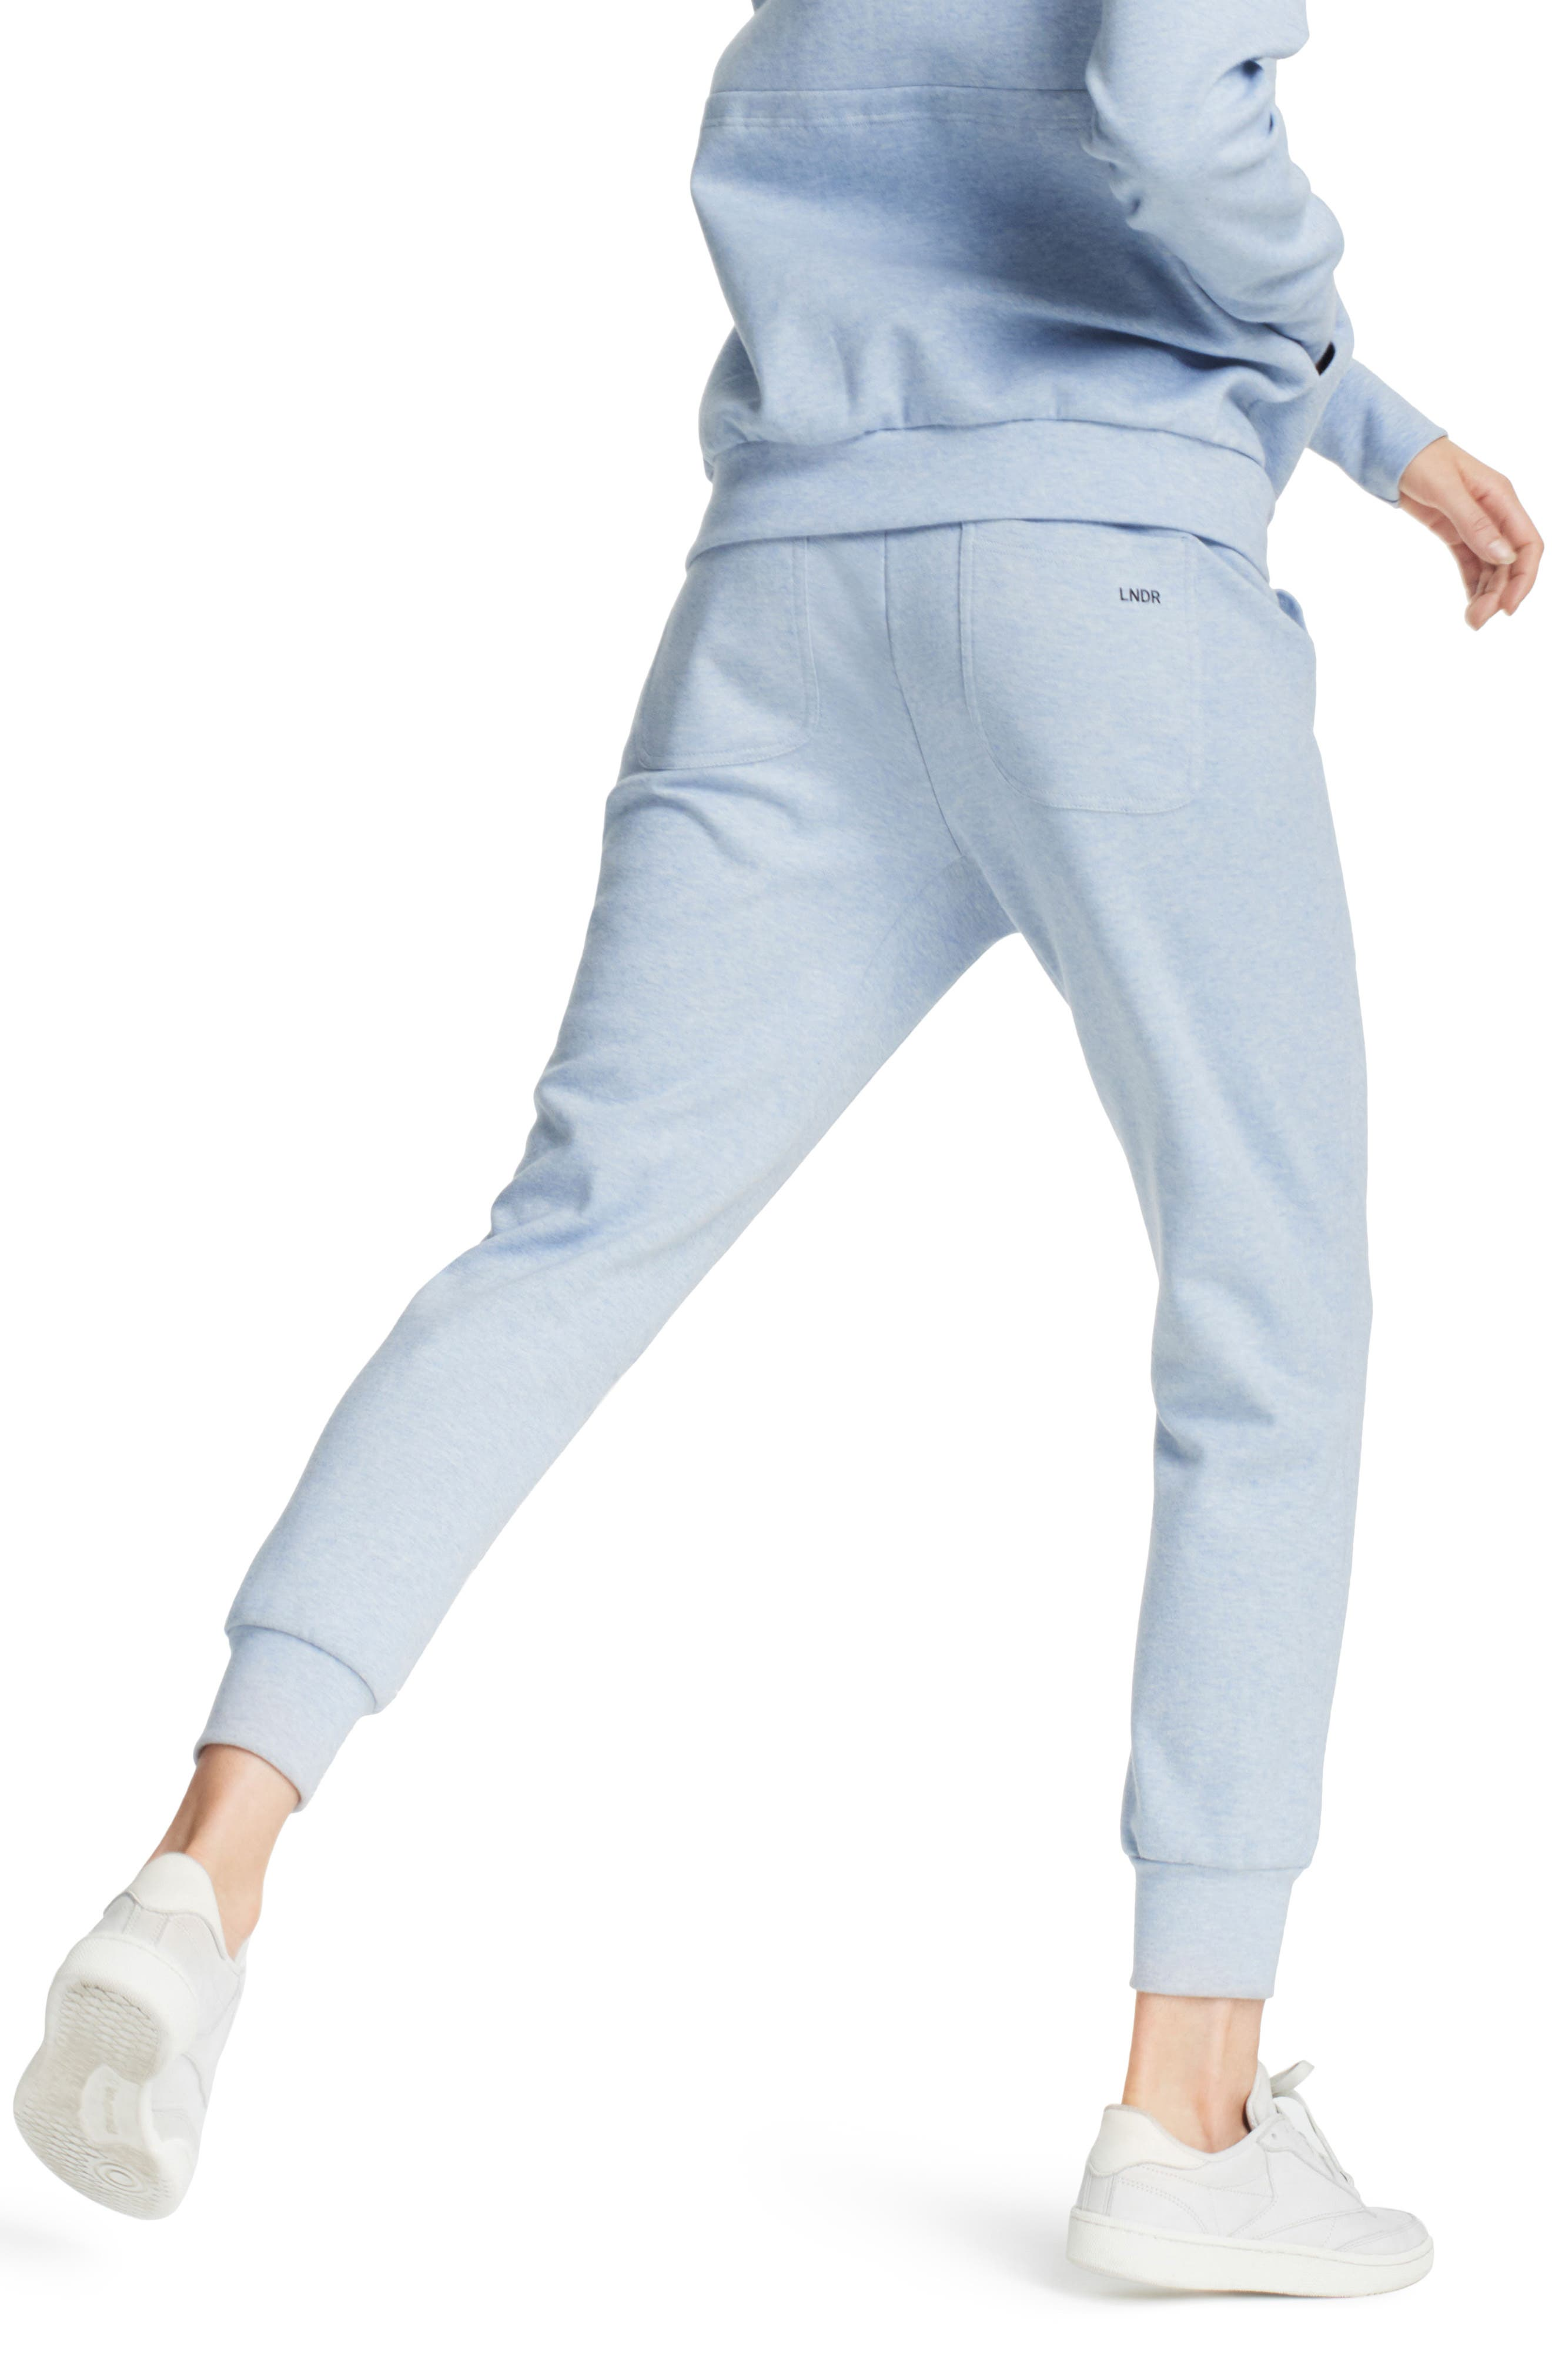 Synergy Track Pants,                             Alternate thumbnail 2, color,                             Light Blue